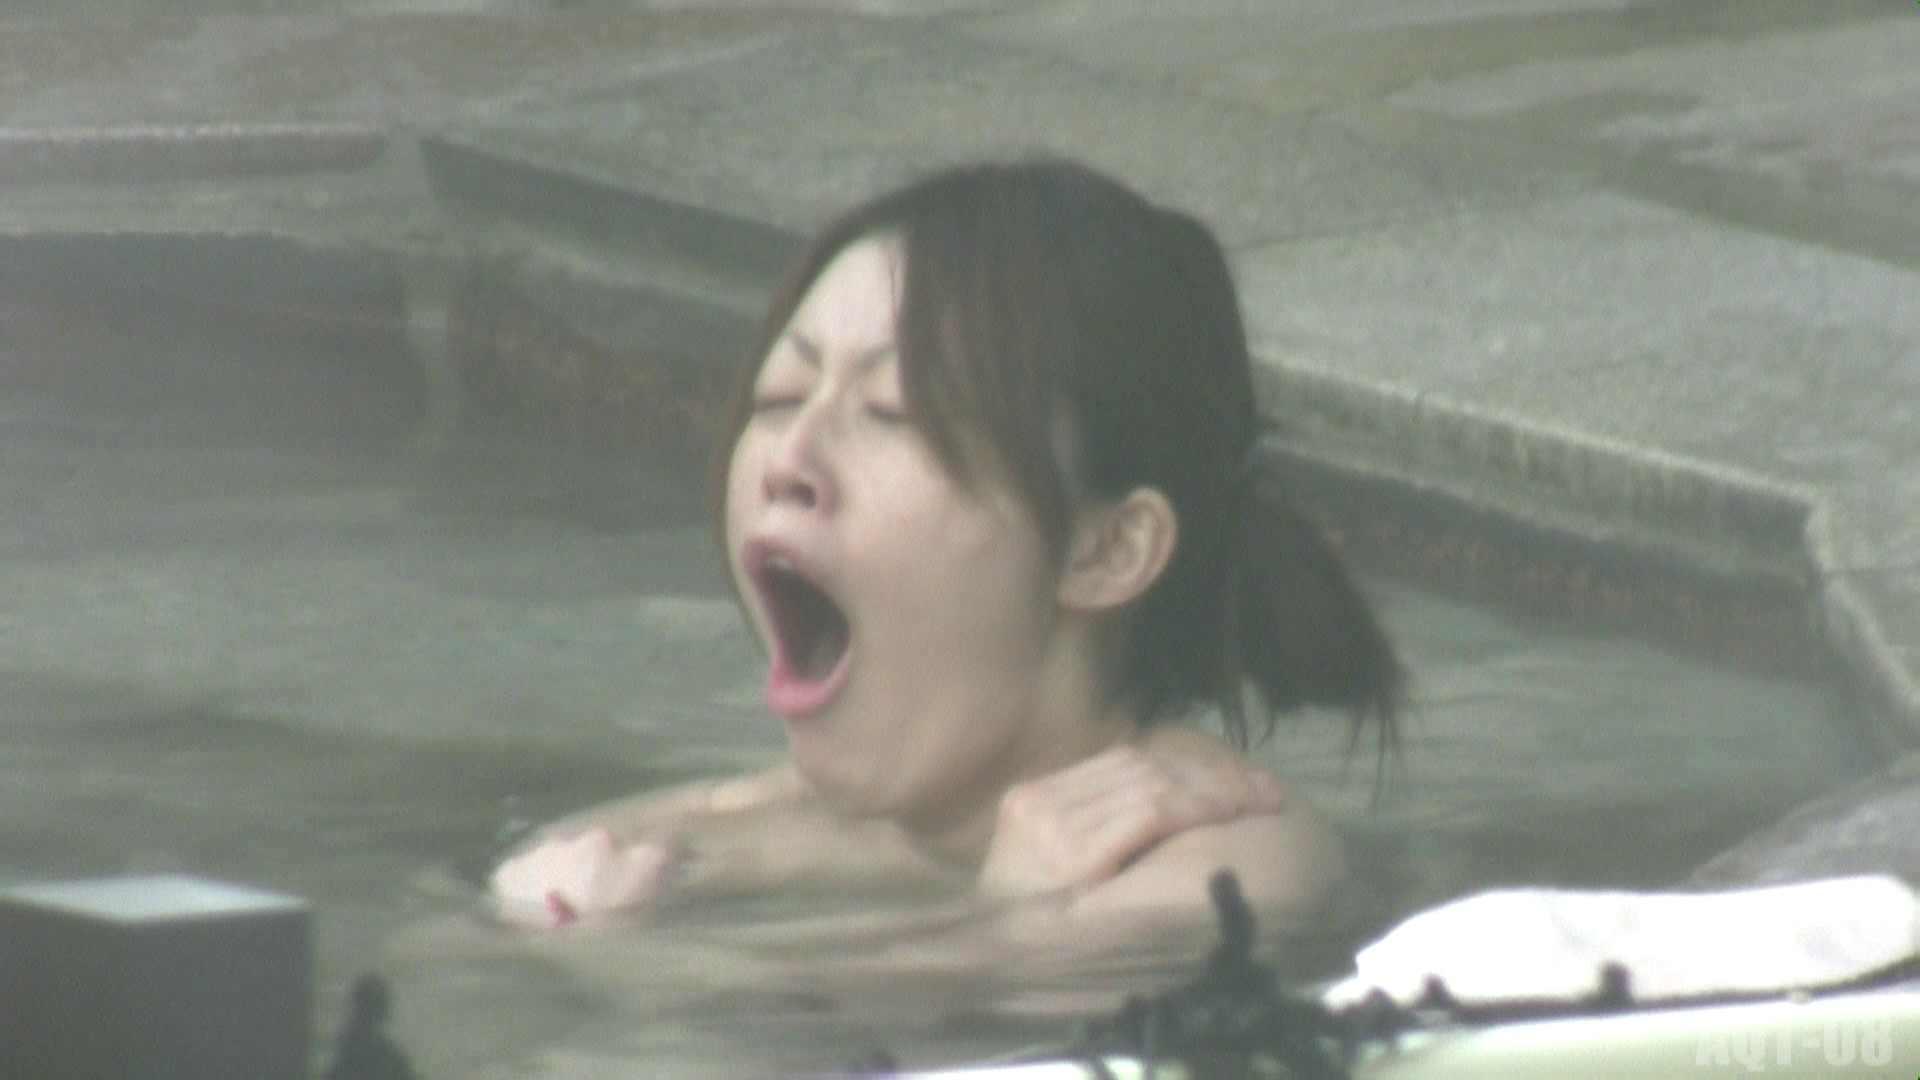 Aquaな露天風呂Vol.775 盗撮映像  74Pix 16